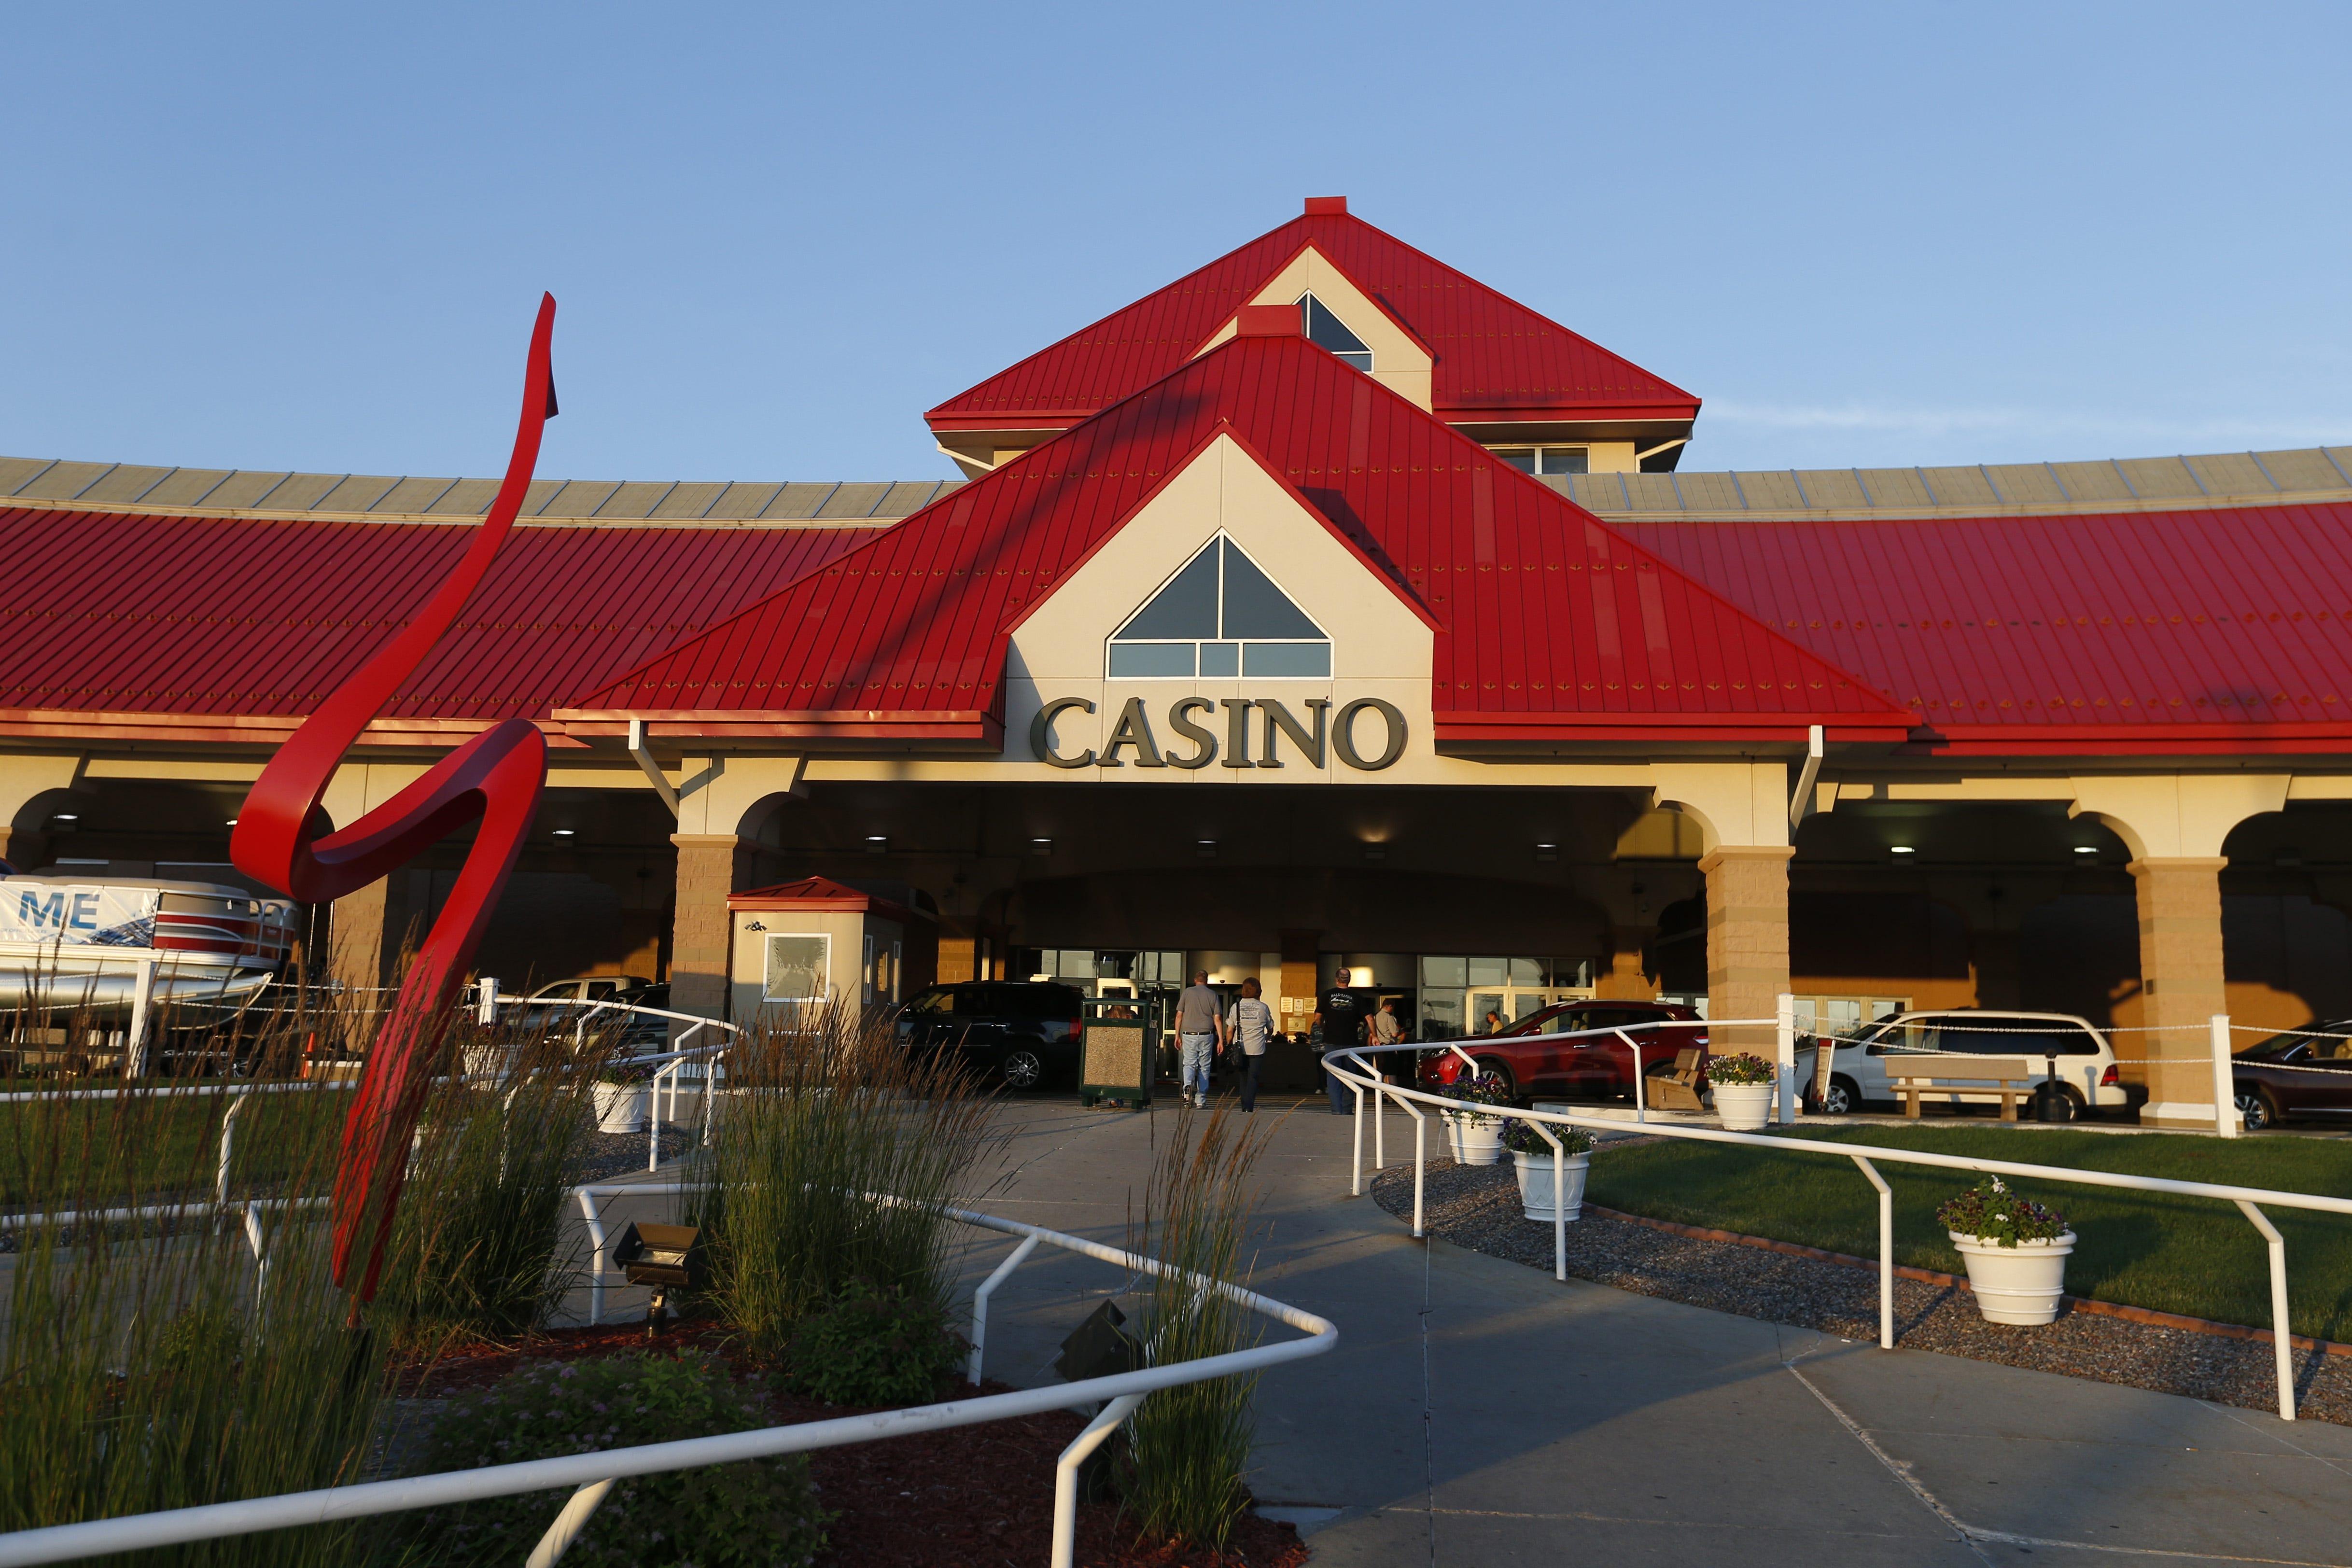 Terrible casino demoins ohio community benefit gambling grant